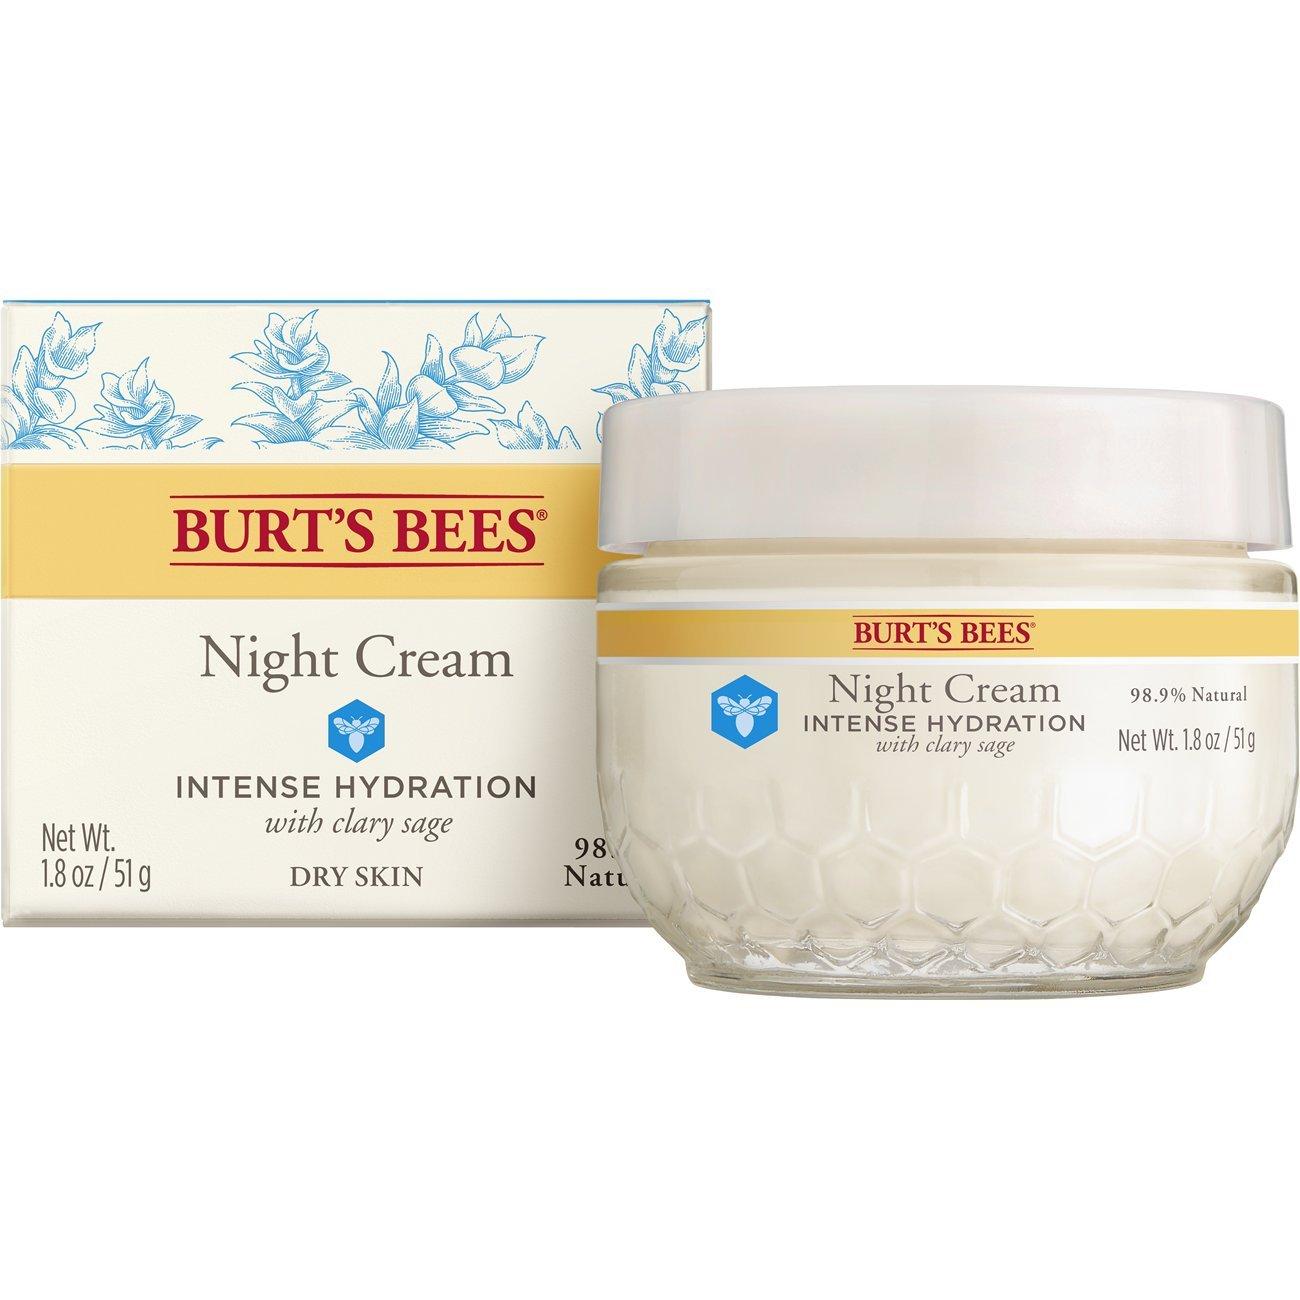 Burt's Bees Intense Hydration Night Cream, Moisturizing Night Lotion, 1.8 Ounces by Burt's Bees